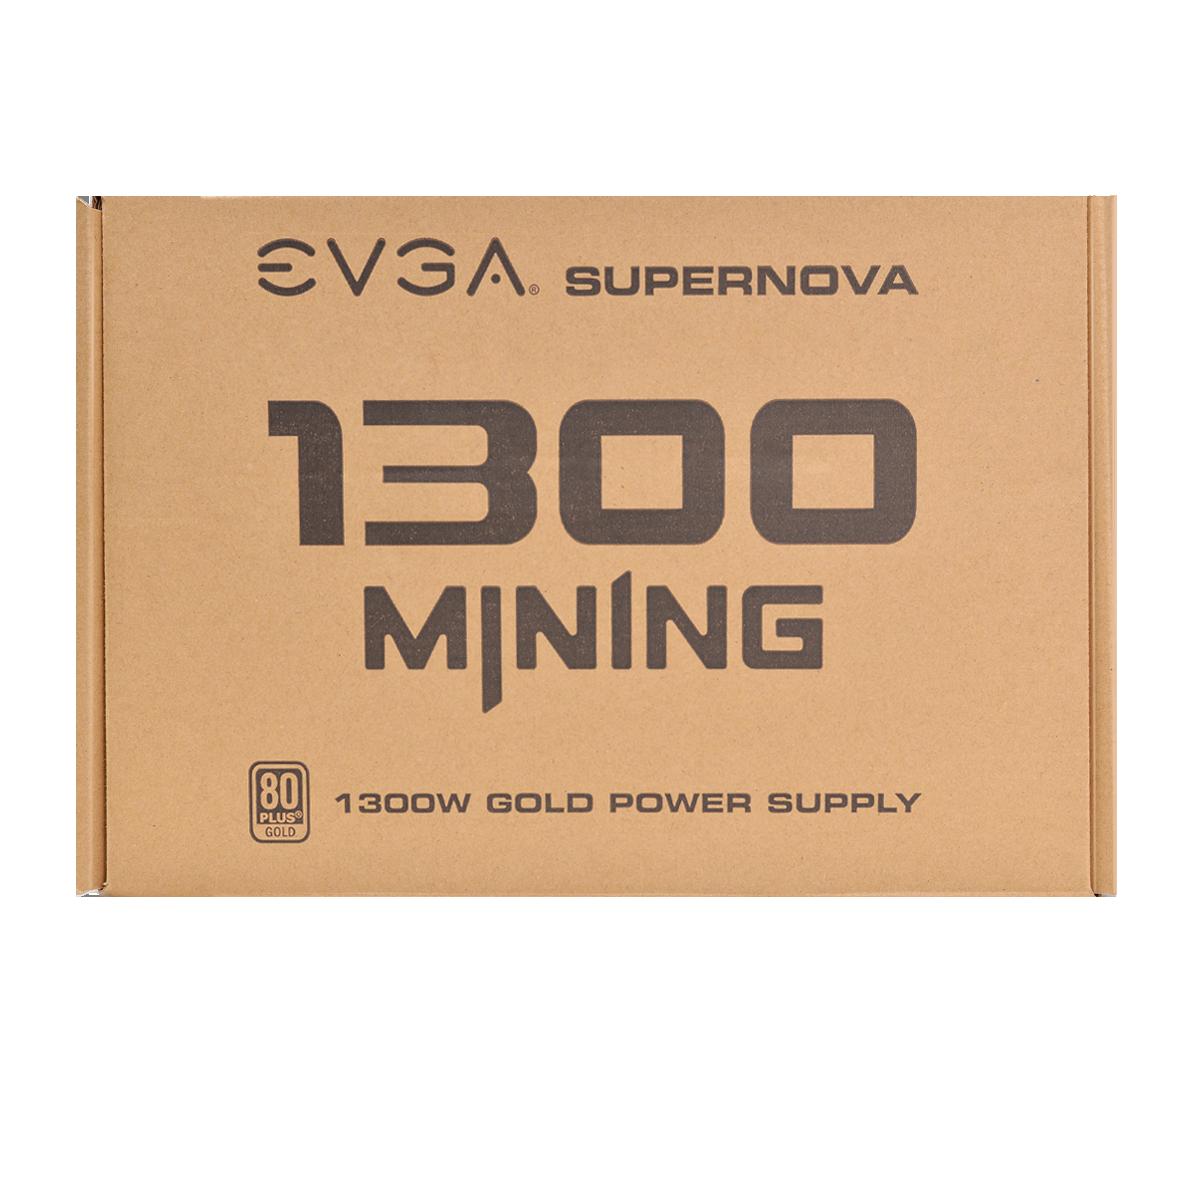 evga-1300-m1-cryptocurrency-mining-psu-_7